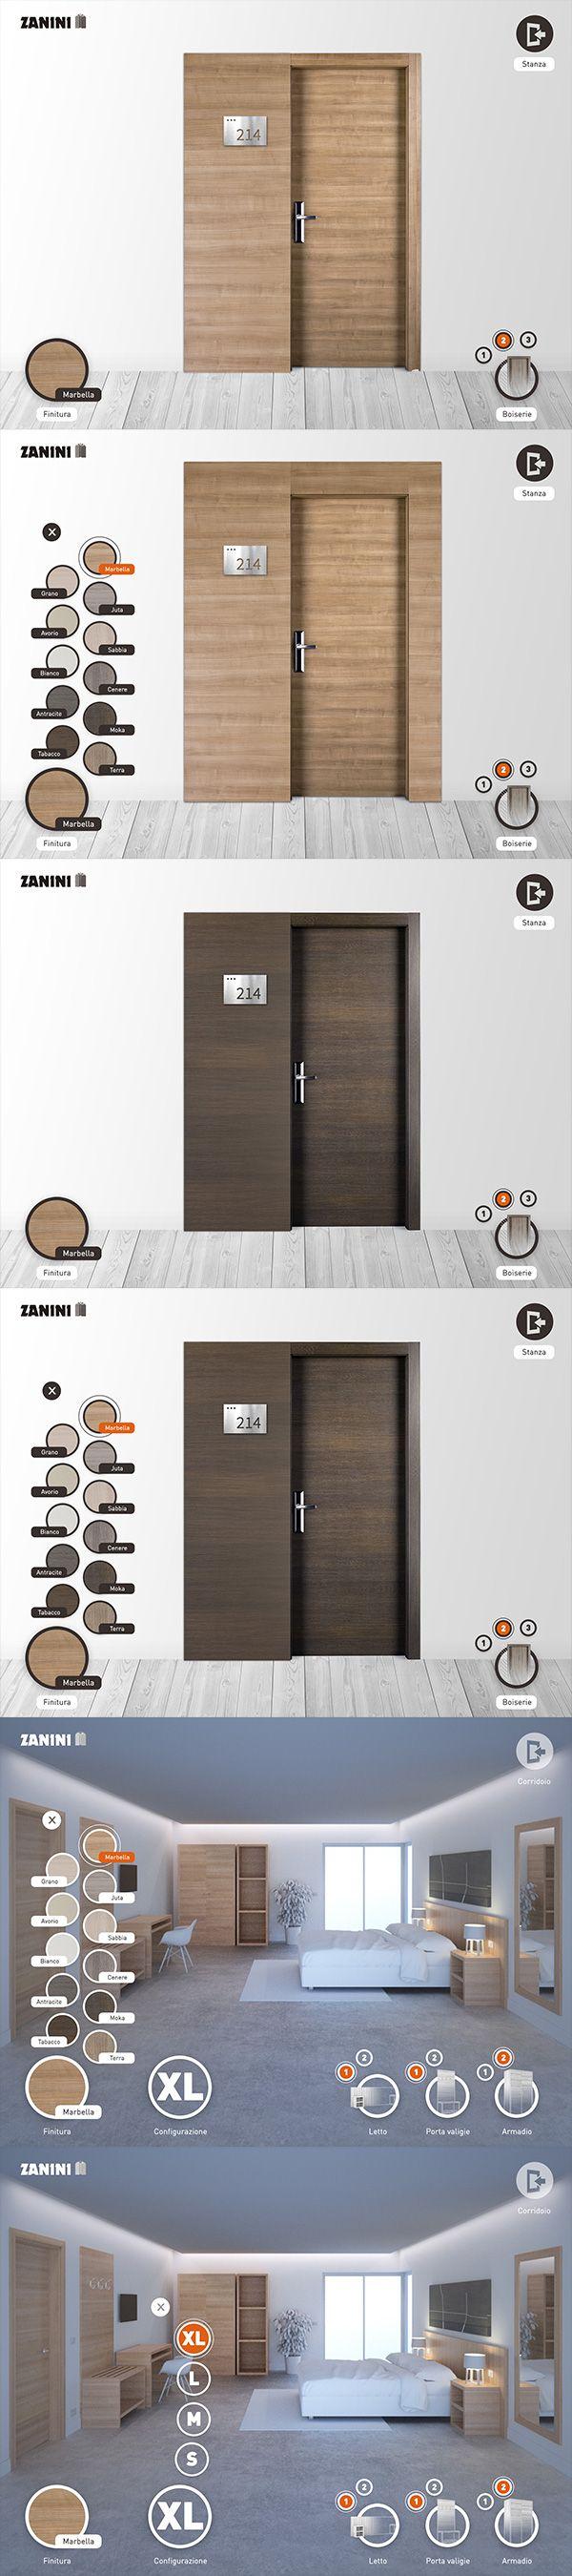 Zanini, hotel doors and rooms